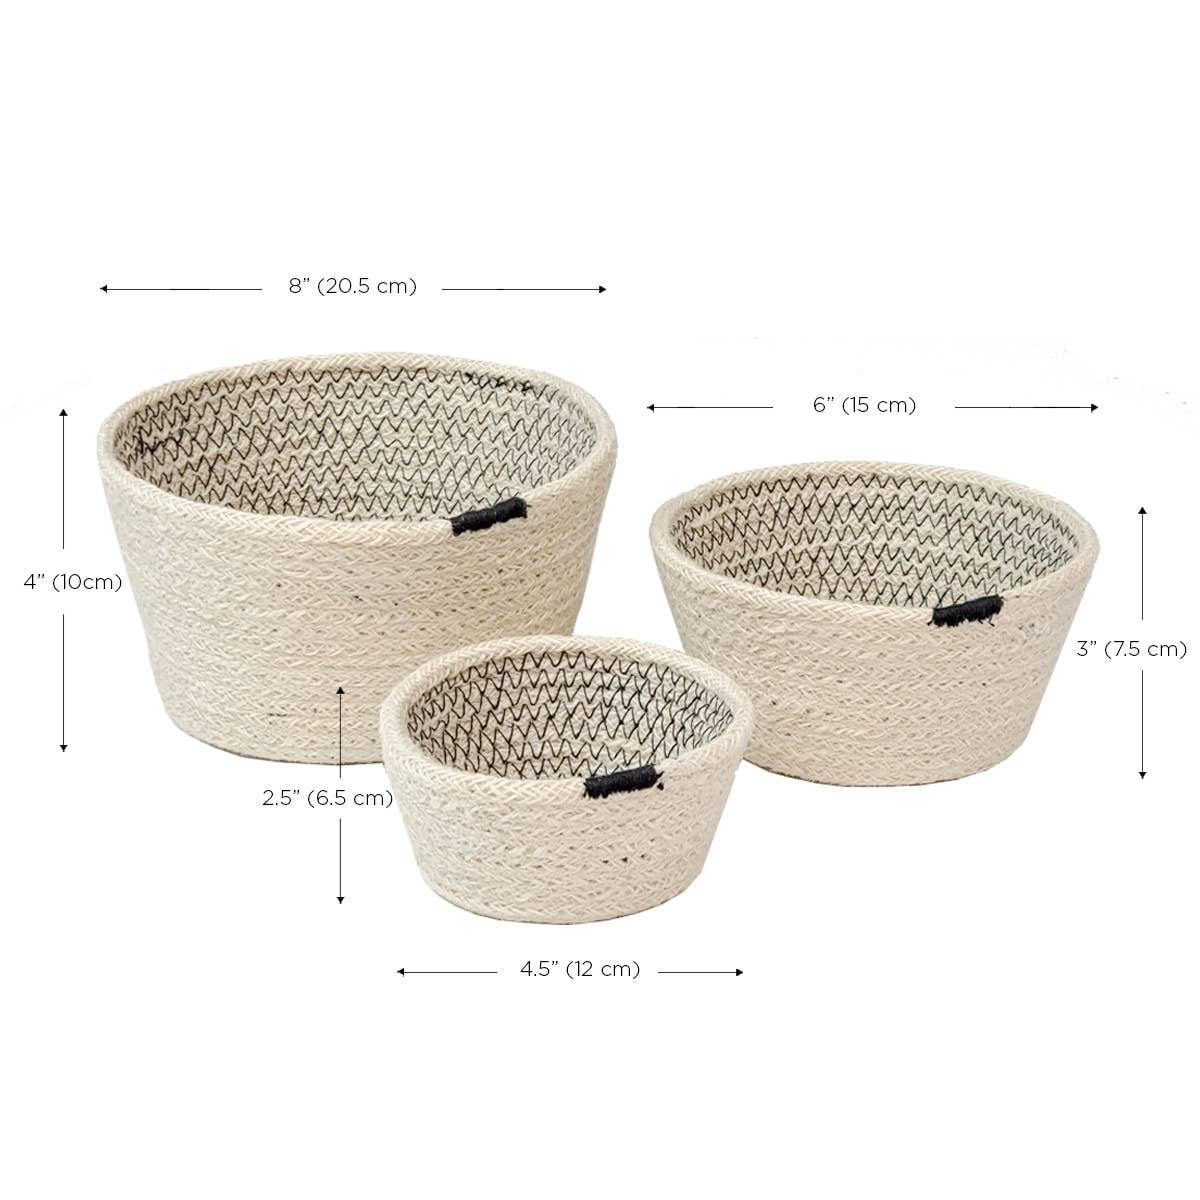 Amari Bowl - Black (Set of 3)   Trada Marketplace